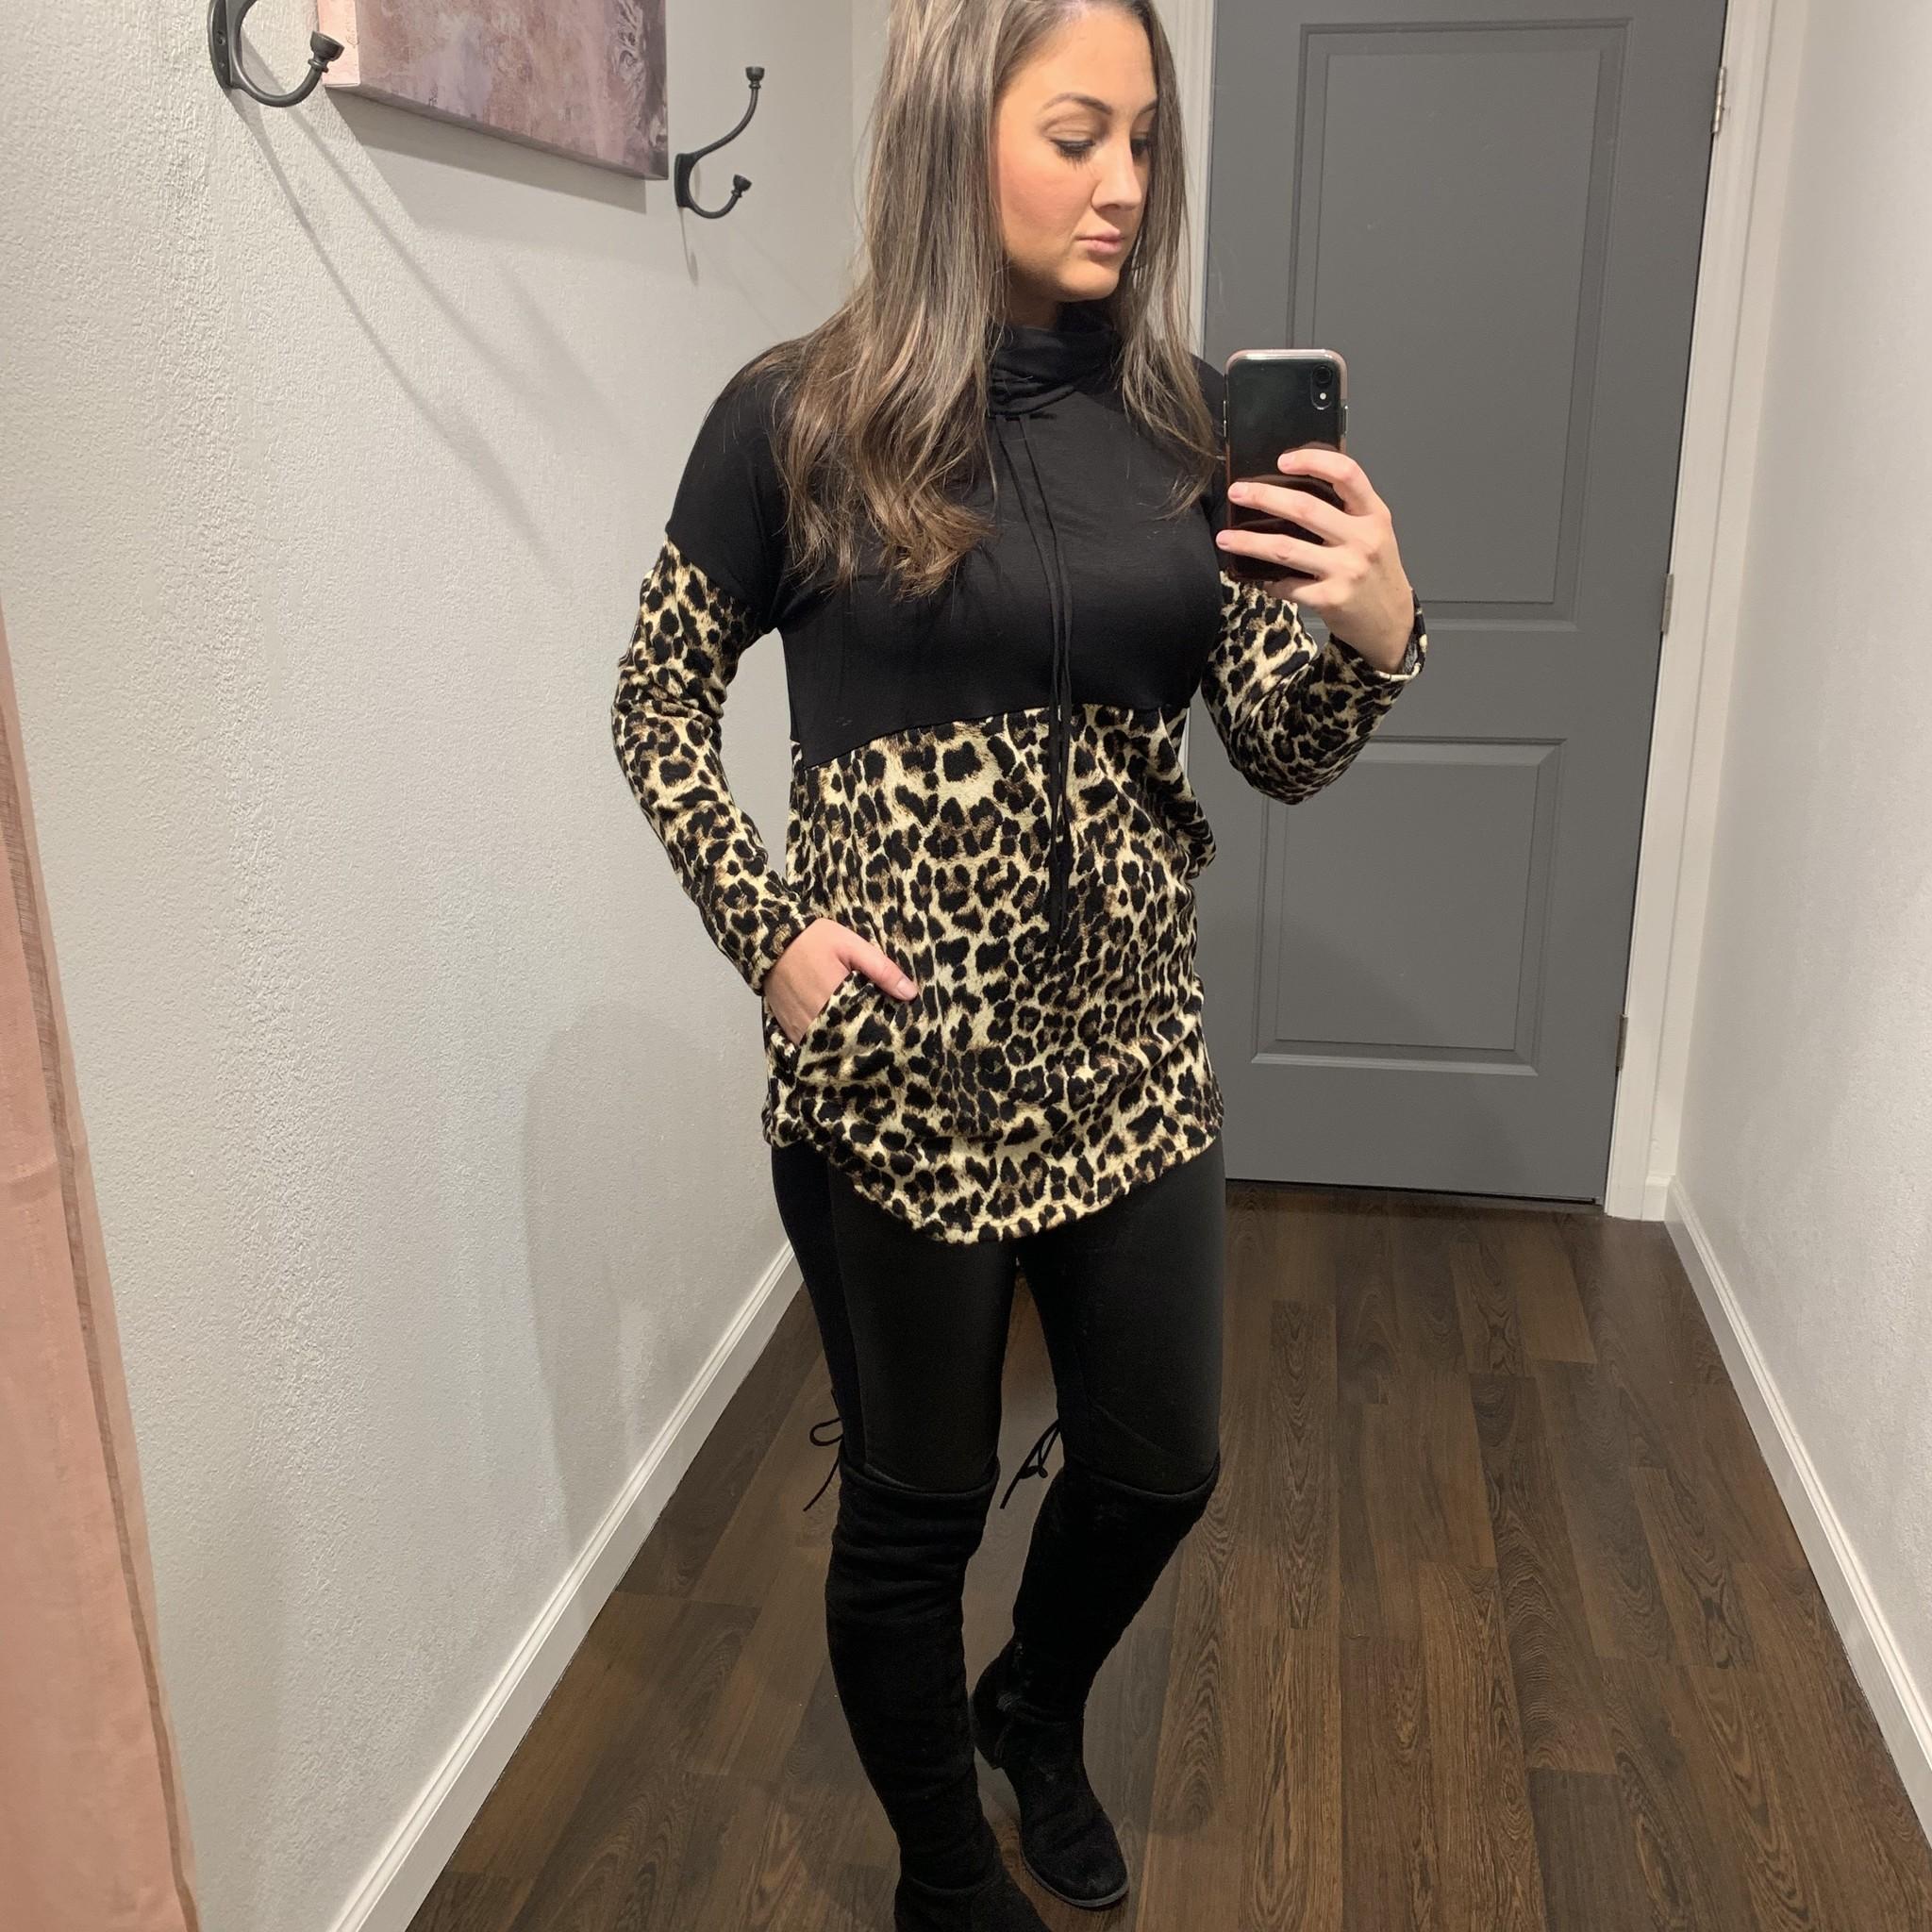 Black/Leopard Tunic